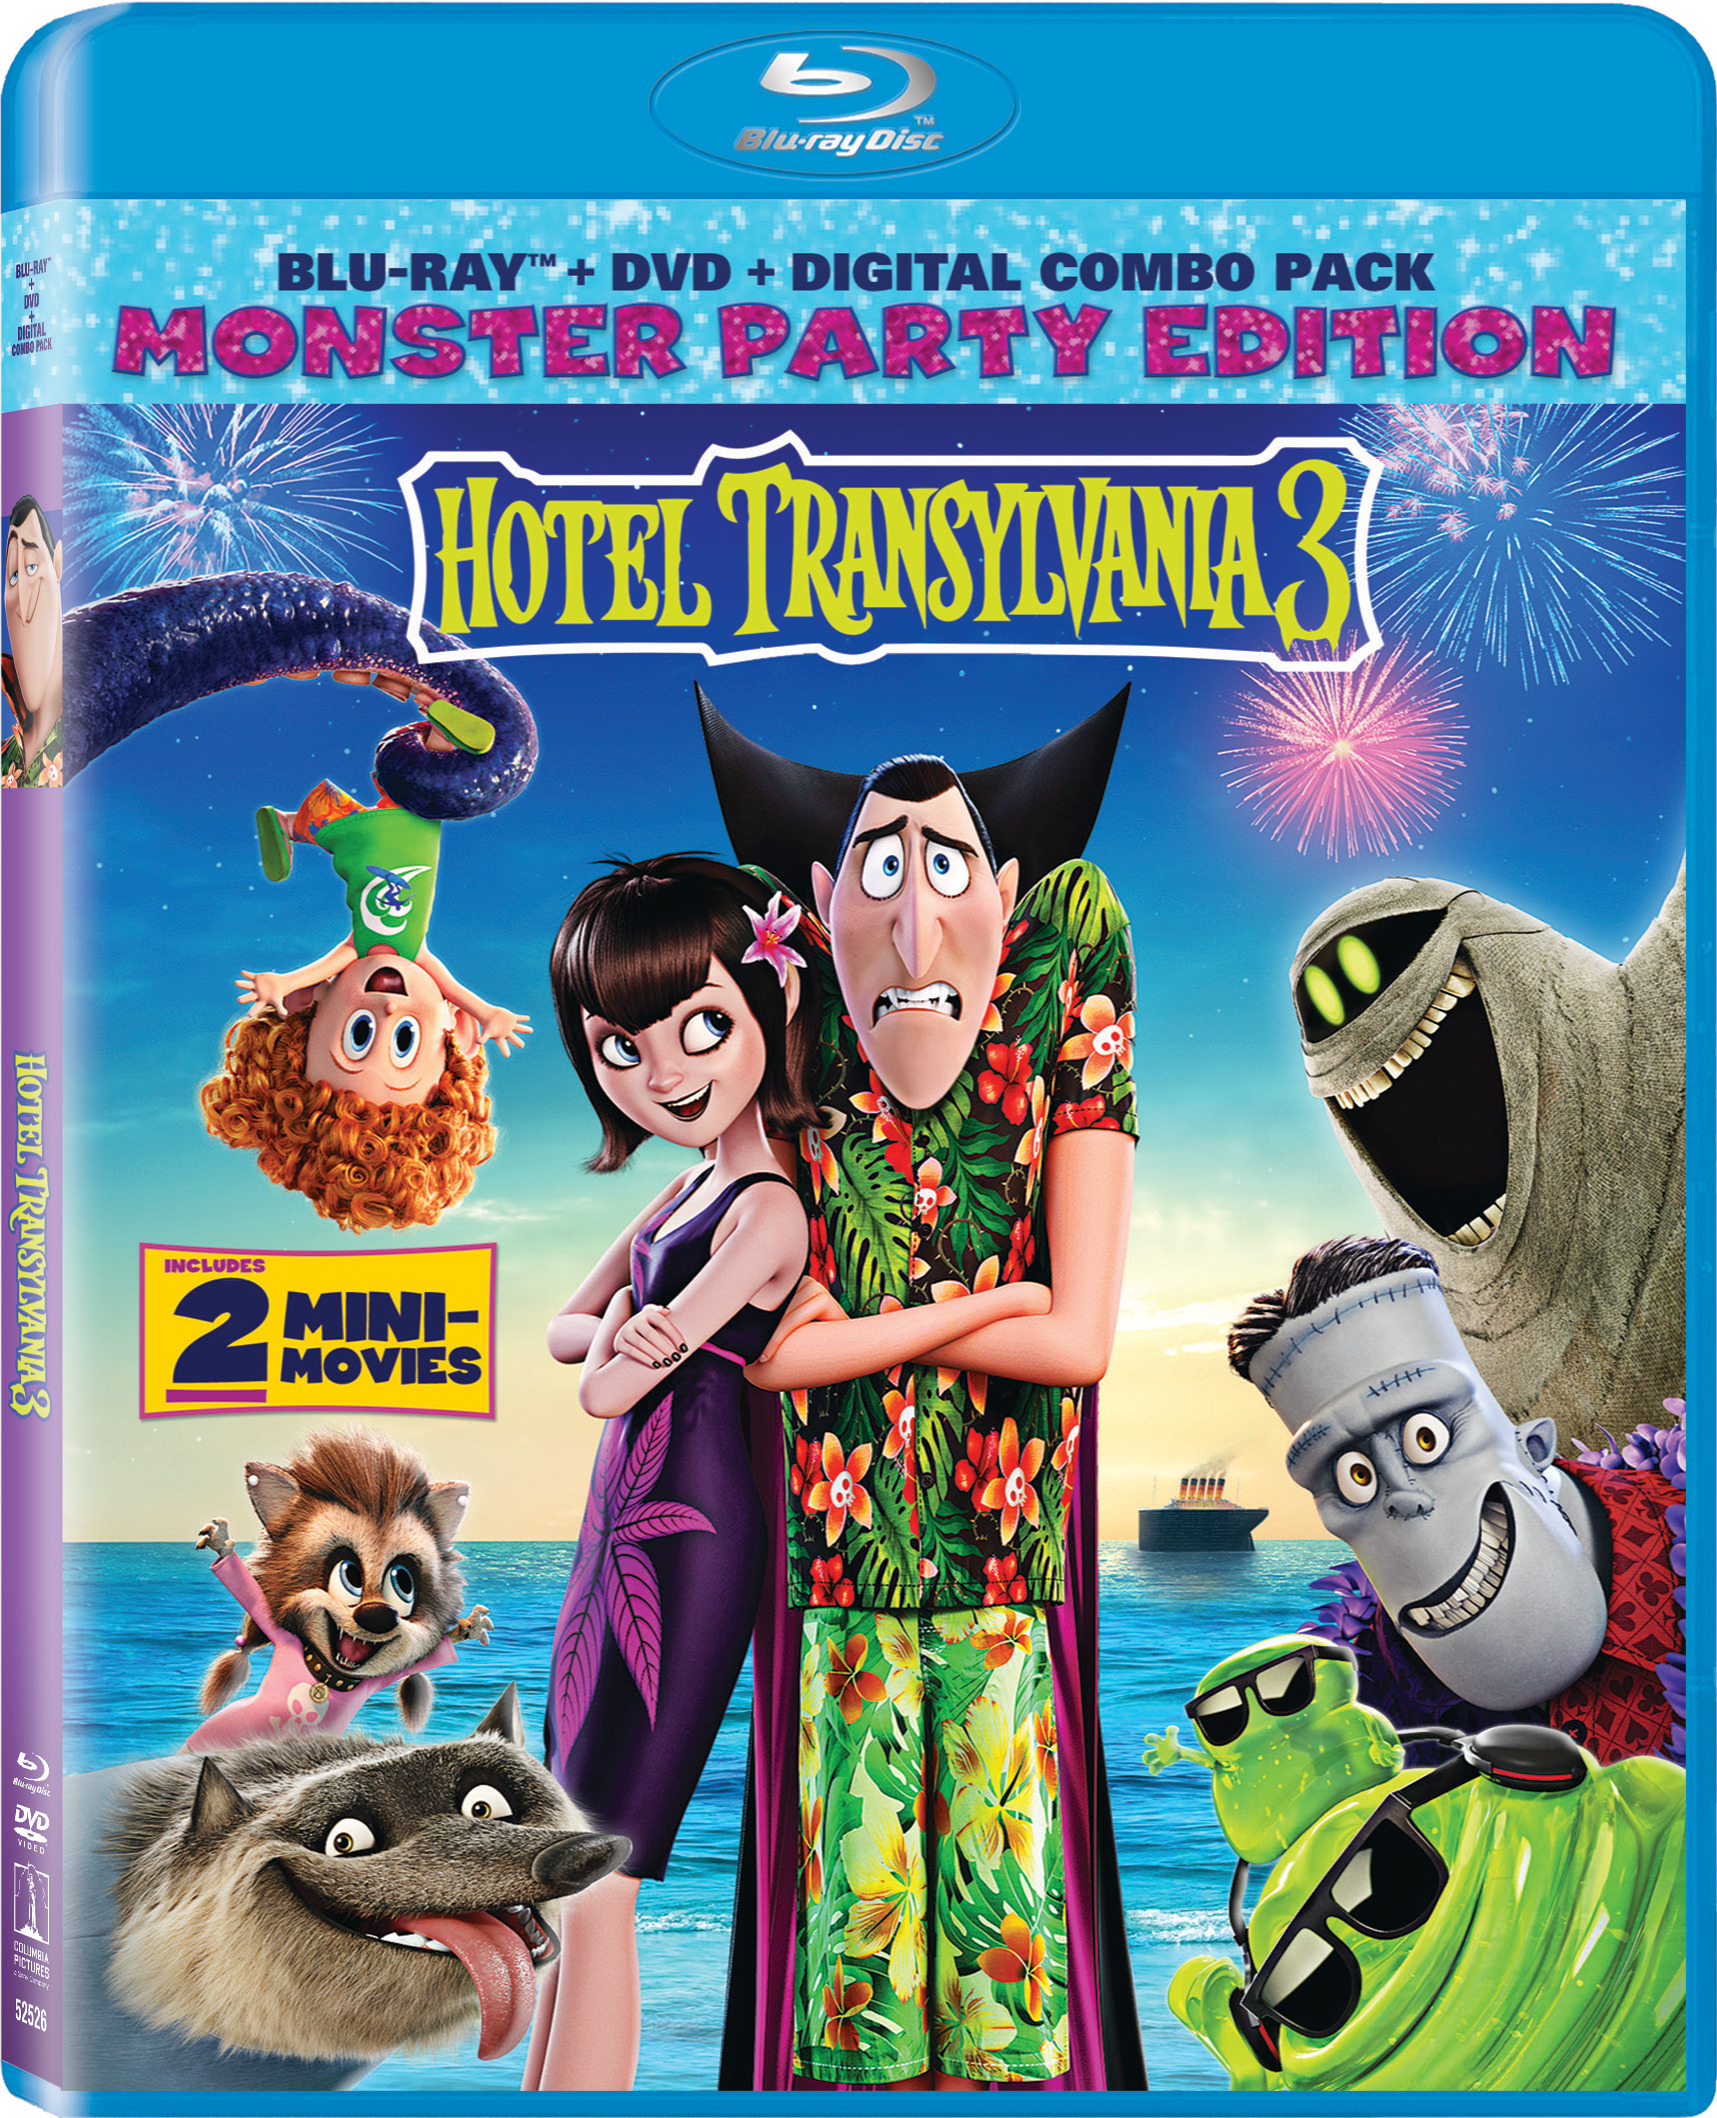 Hotel transylvania release date in Melbourne